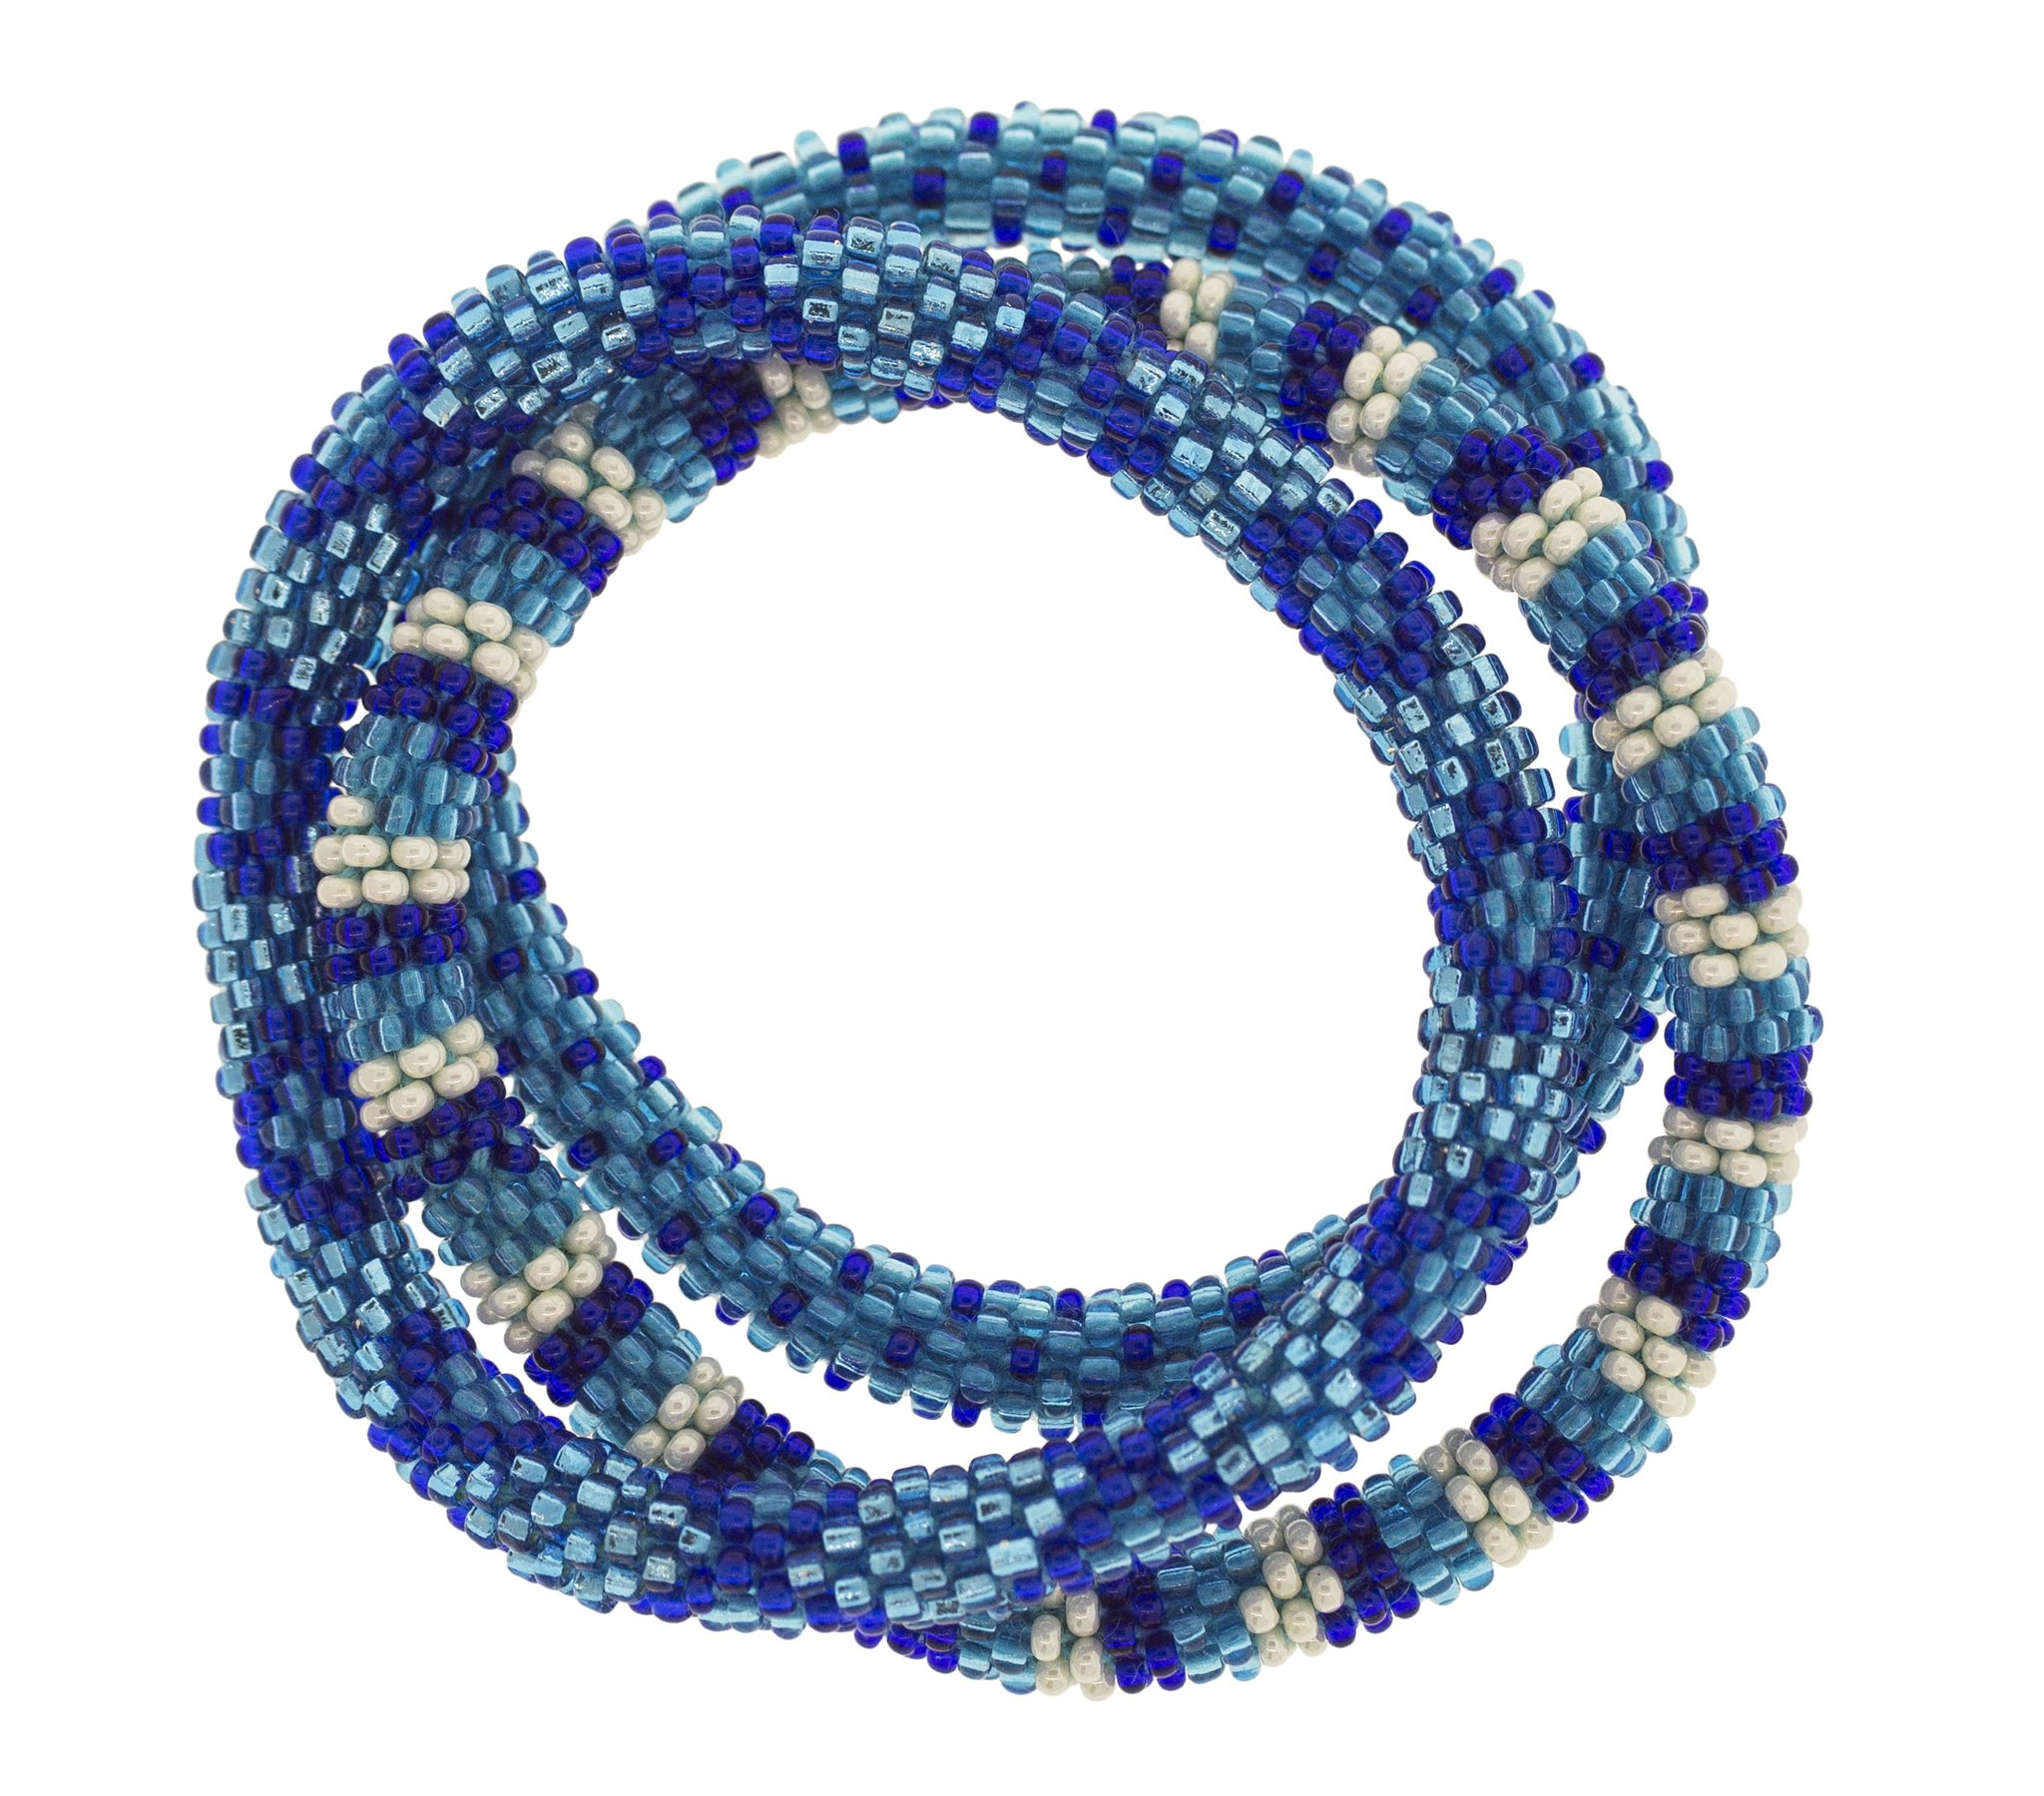 3 sæt Perle armbånd Blue